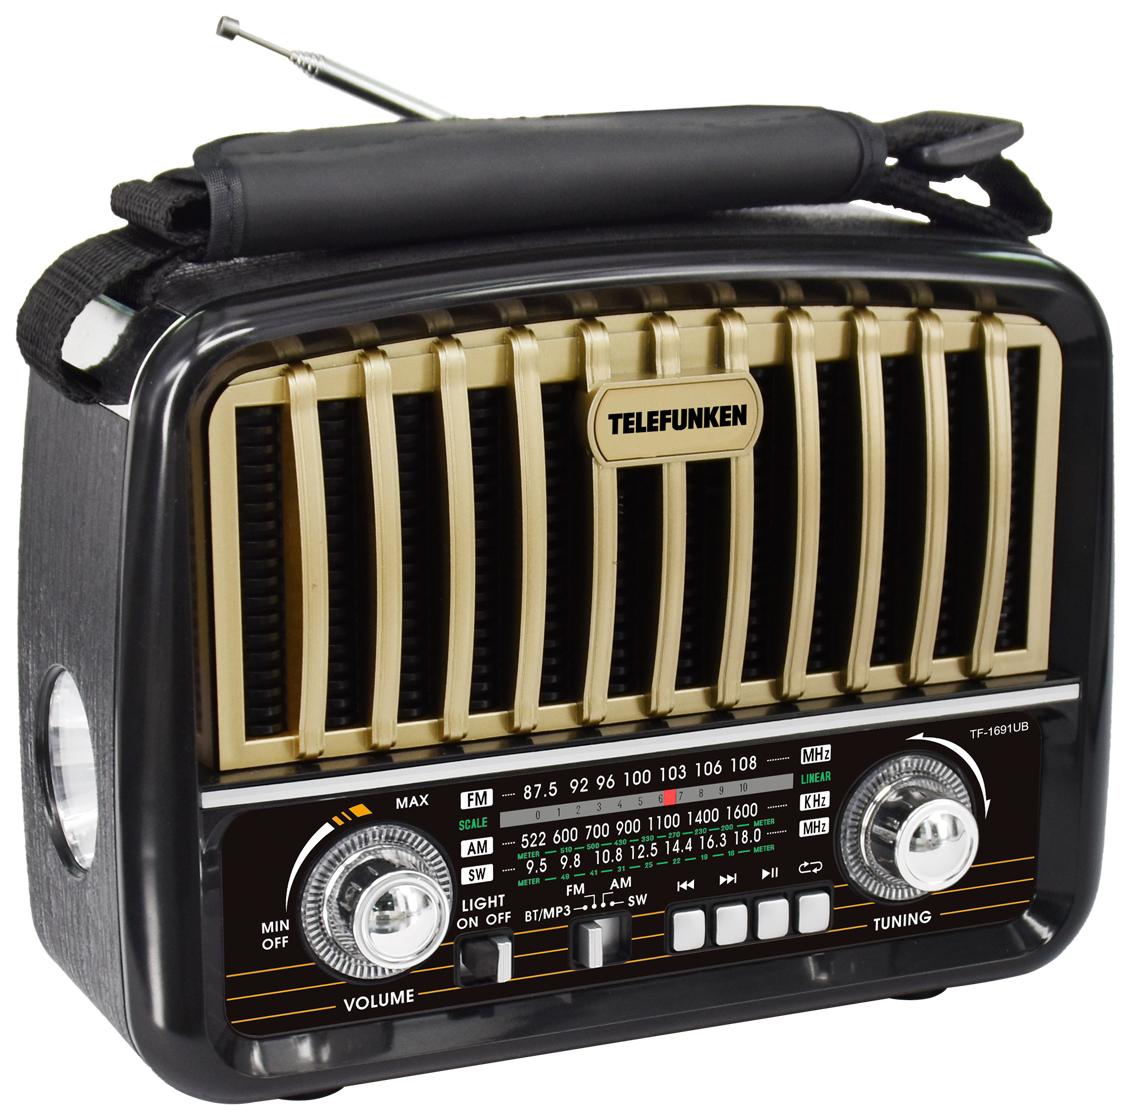 Радиоприемник Telefunken TF-1691UB фото